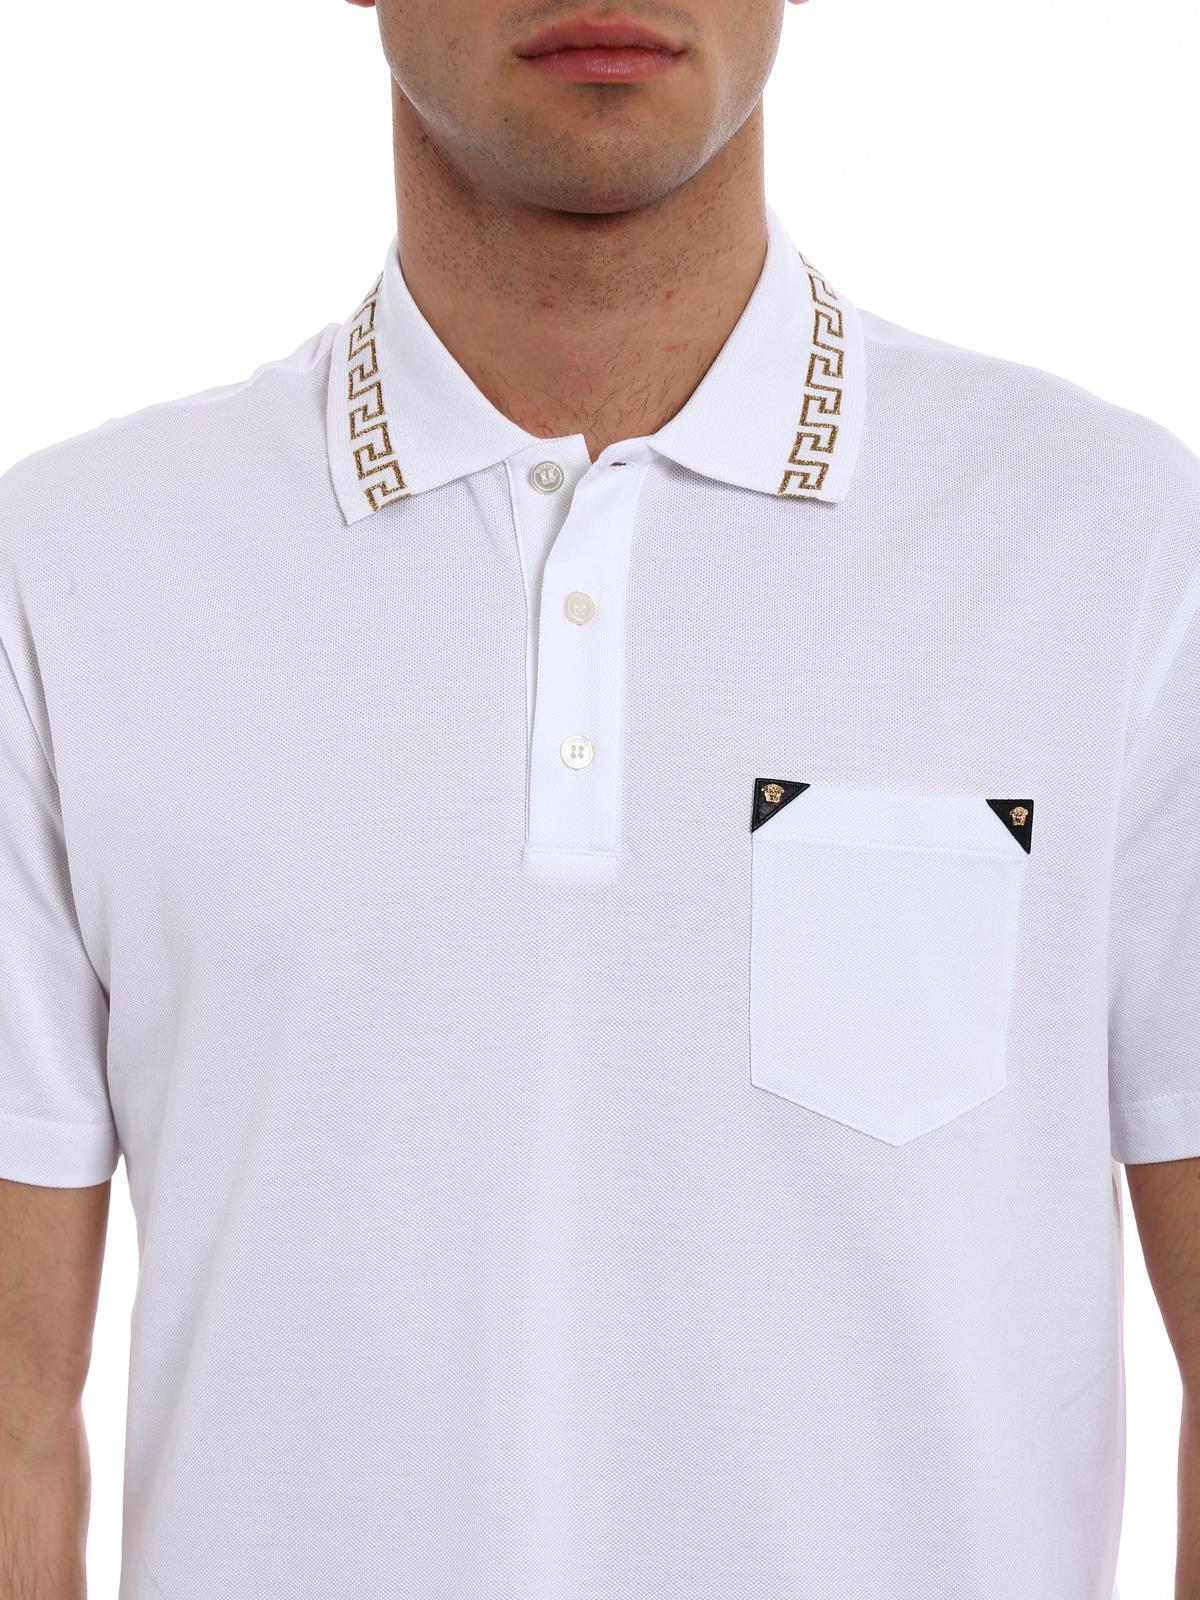 645c6436 Versace - Gold Medusa embroidered white polo - polo shirts ...